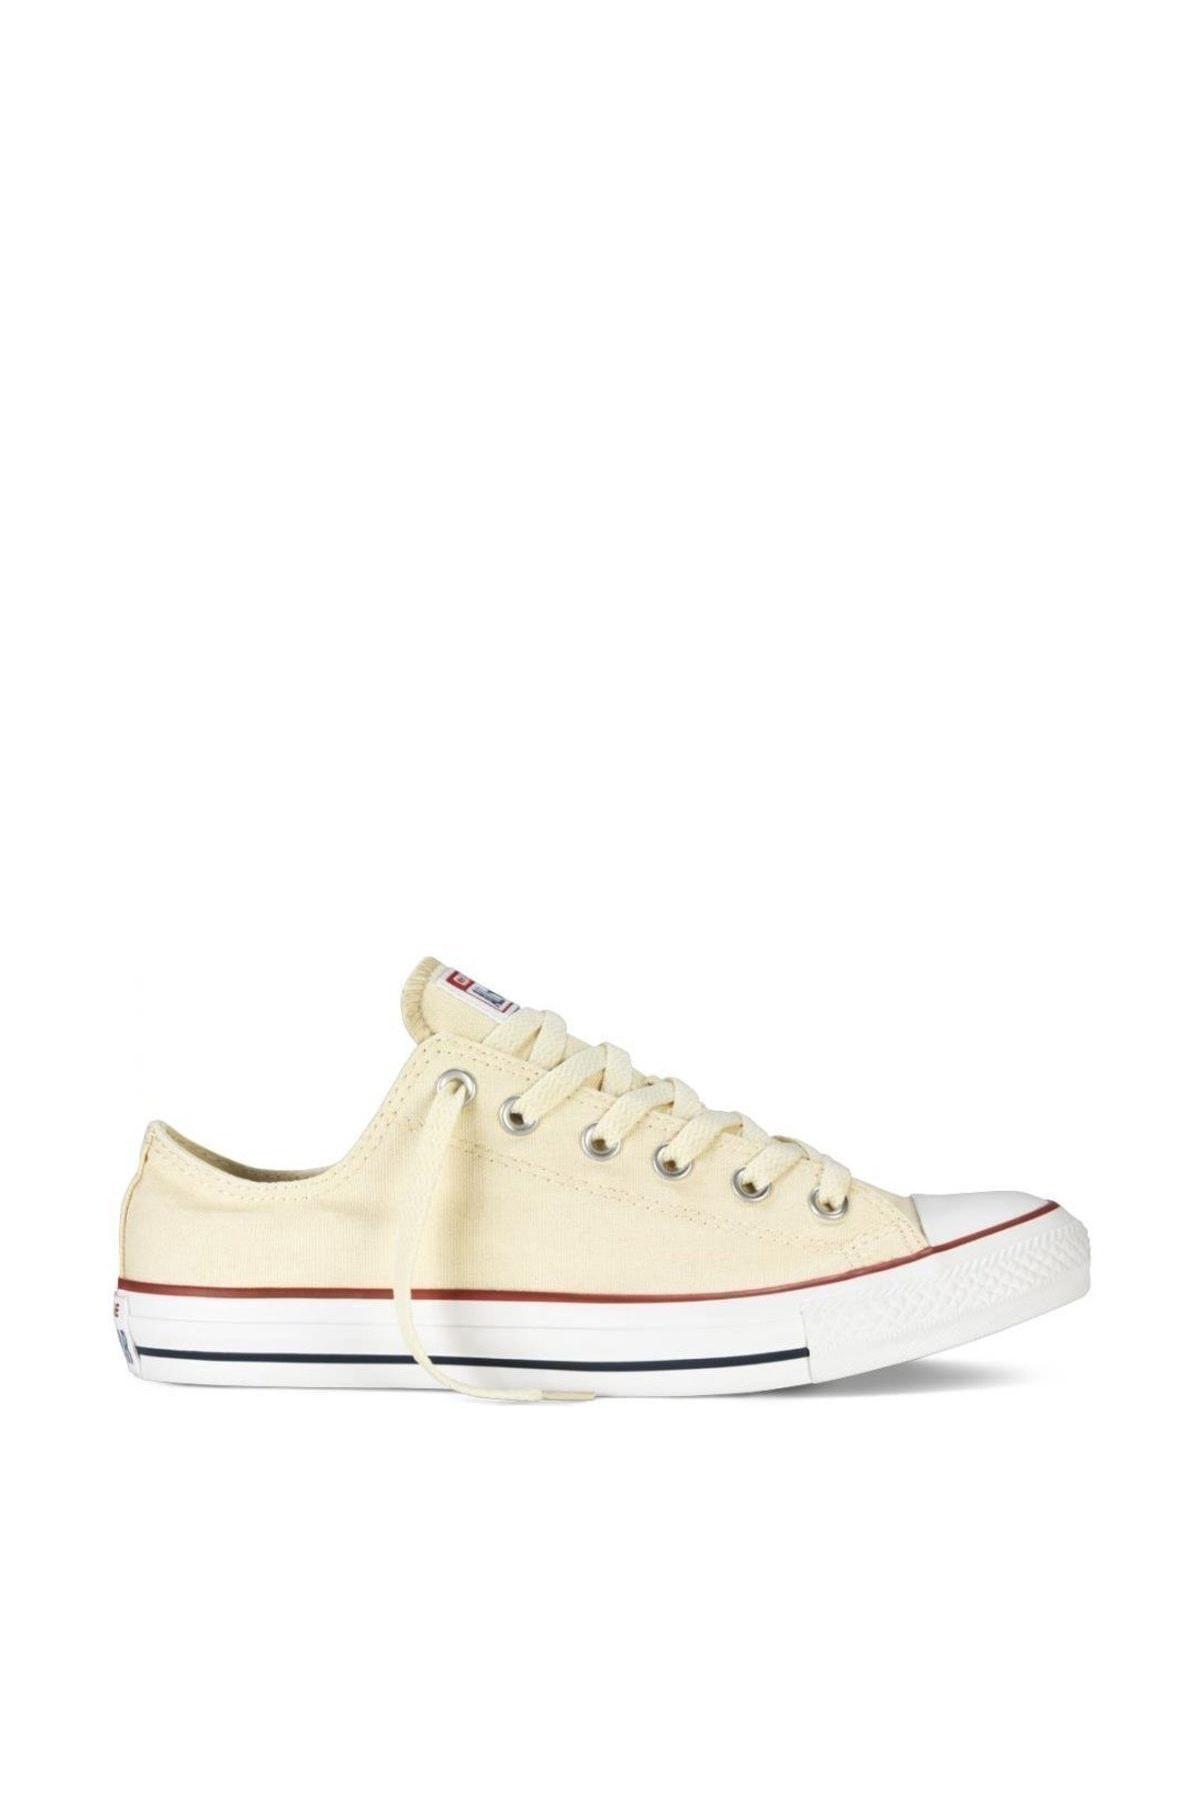 converse C TAYLOR AS CORE HI Unisex Spor Ayakkabı 1